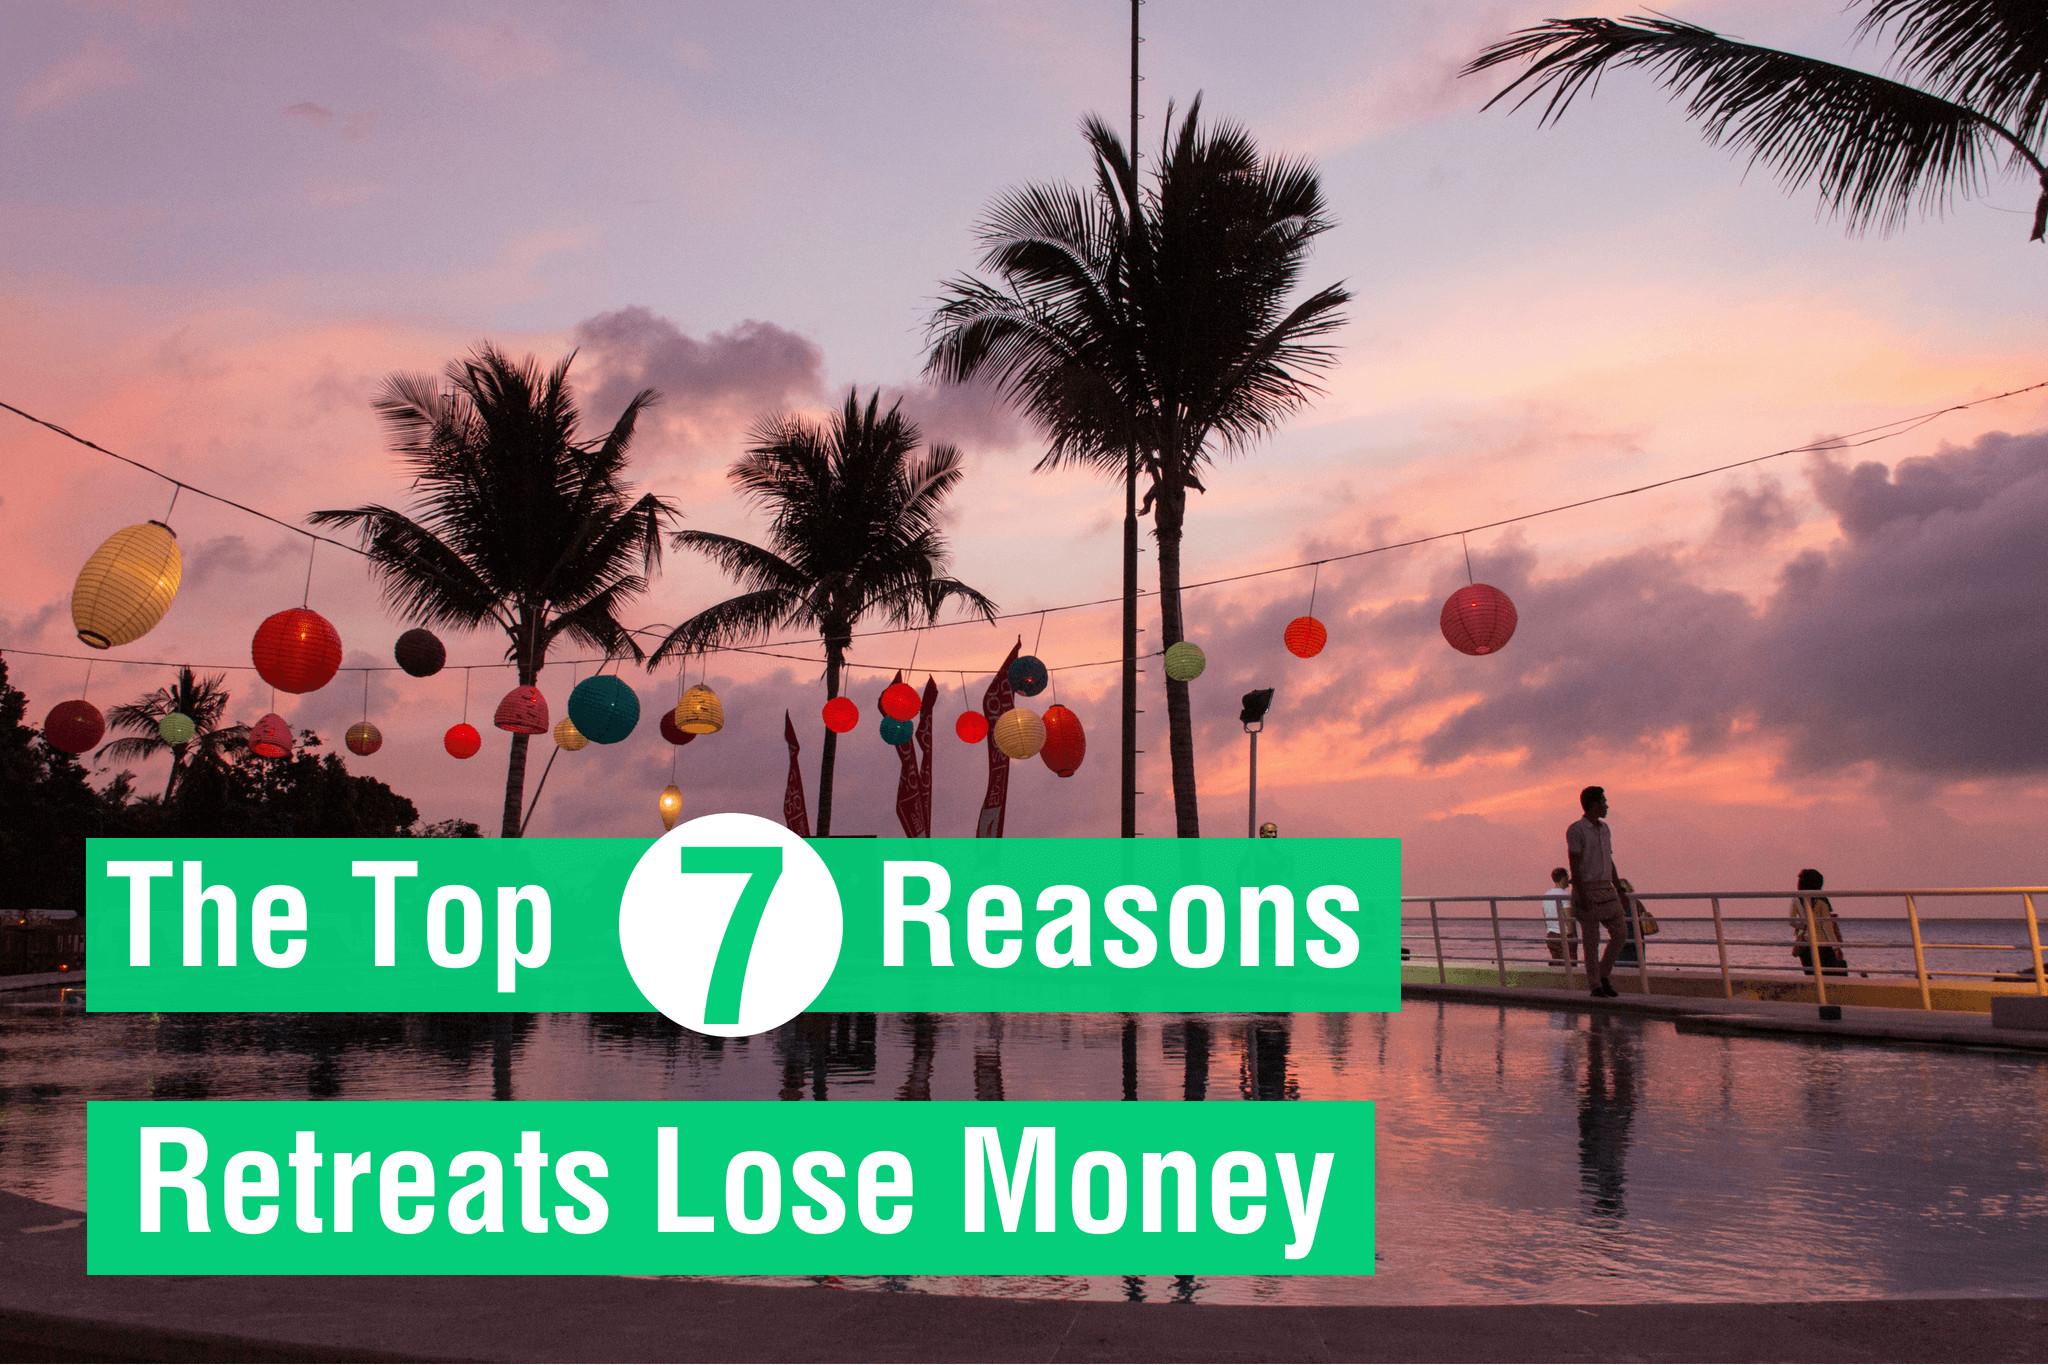 The Top 7 Reasons Retreats Lose Money